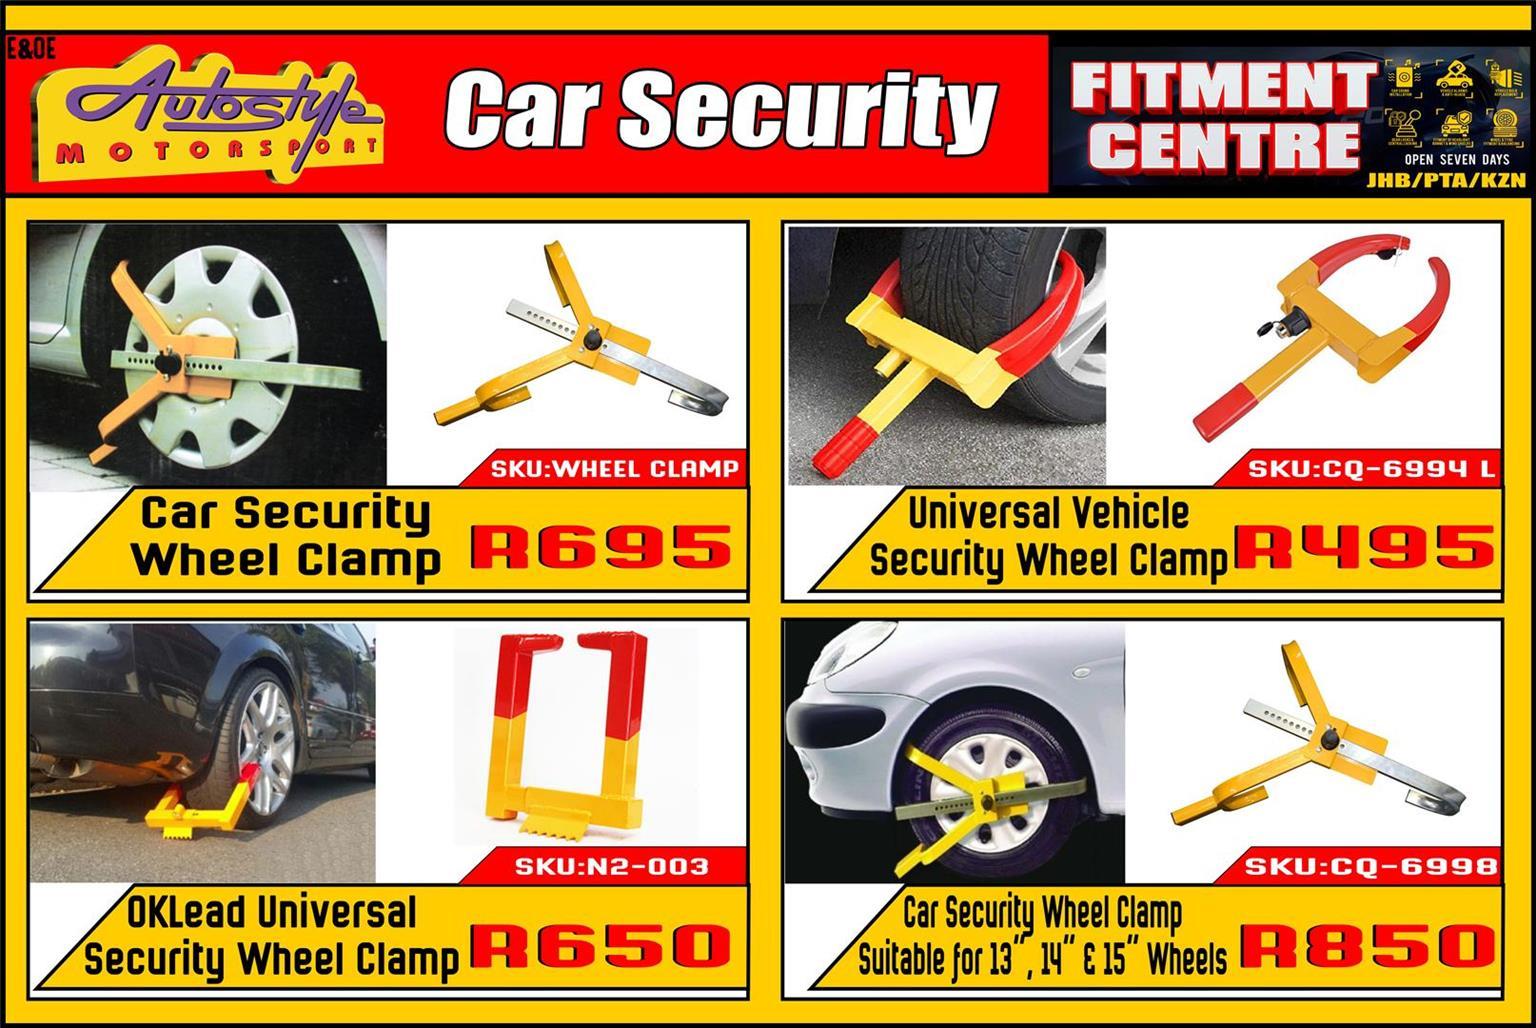 Car Security Wheel Clamp